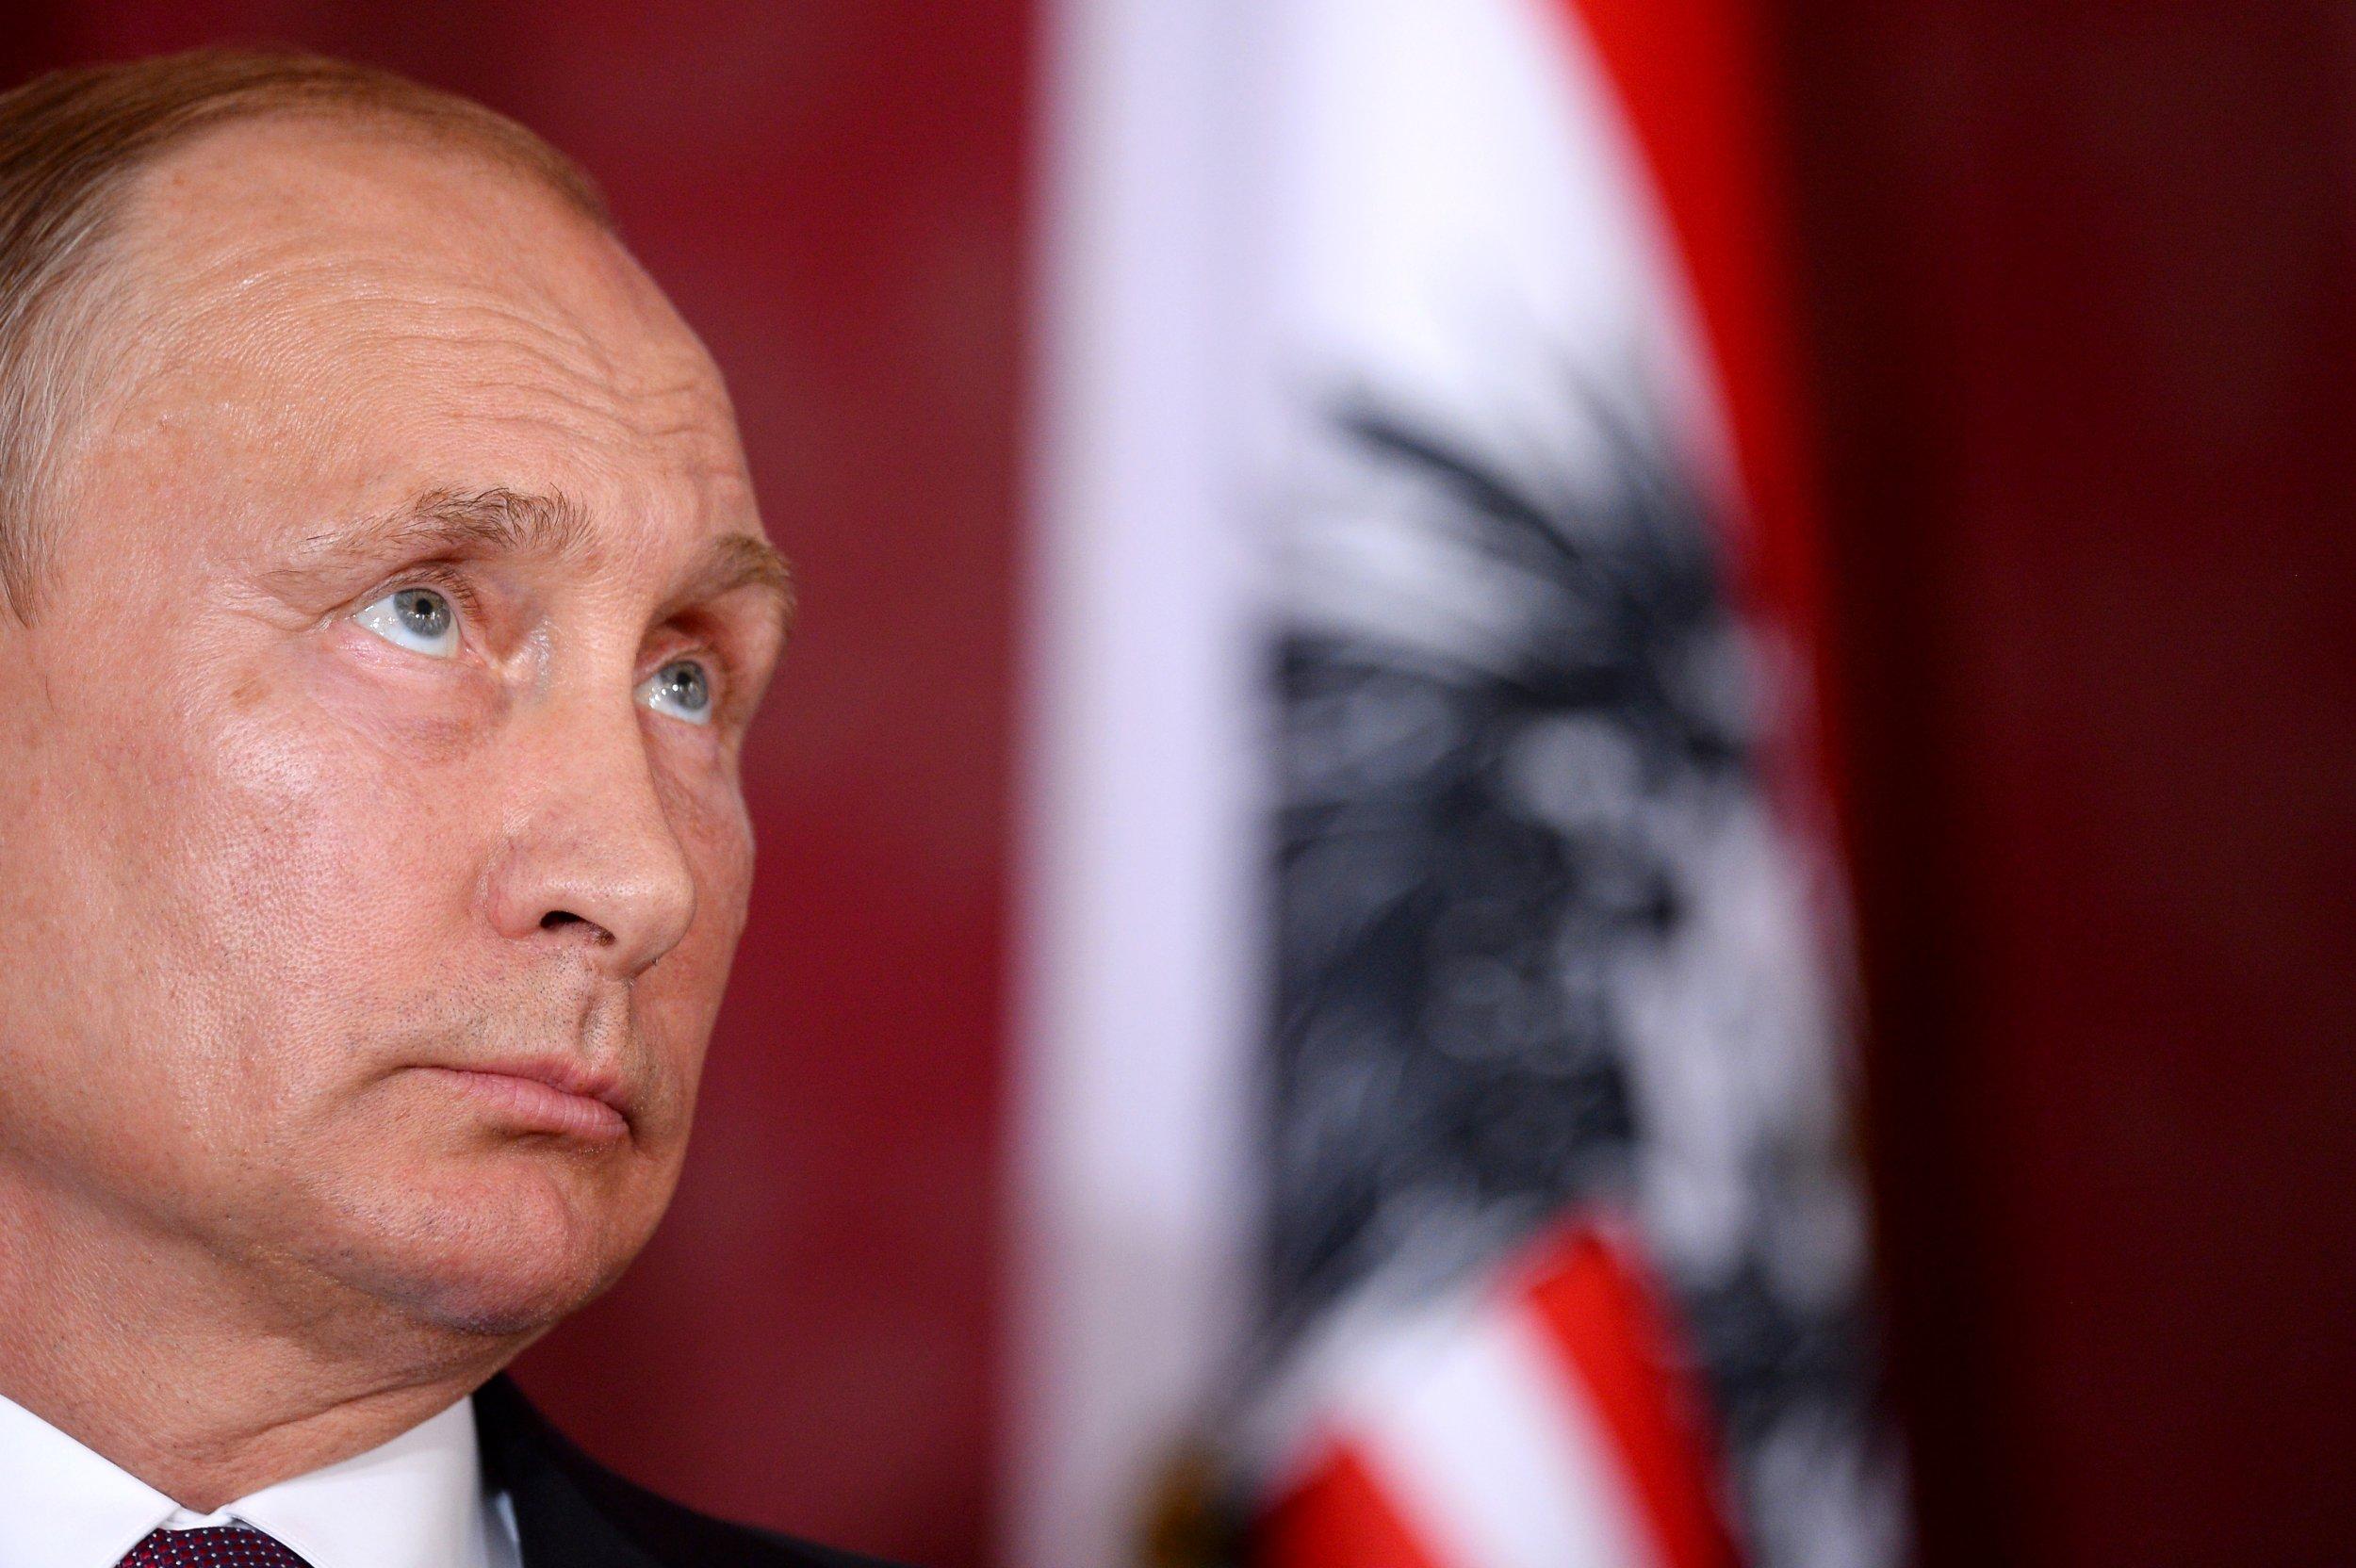 Could garbage bring down Putin? | Opinion